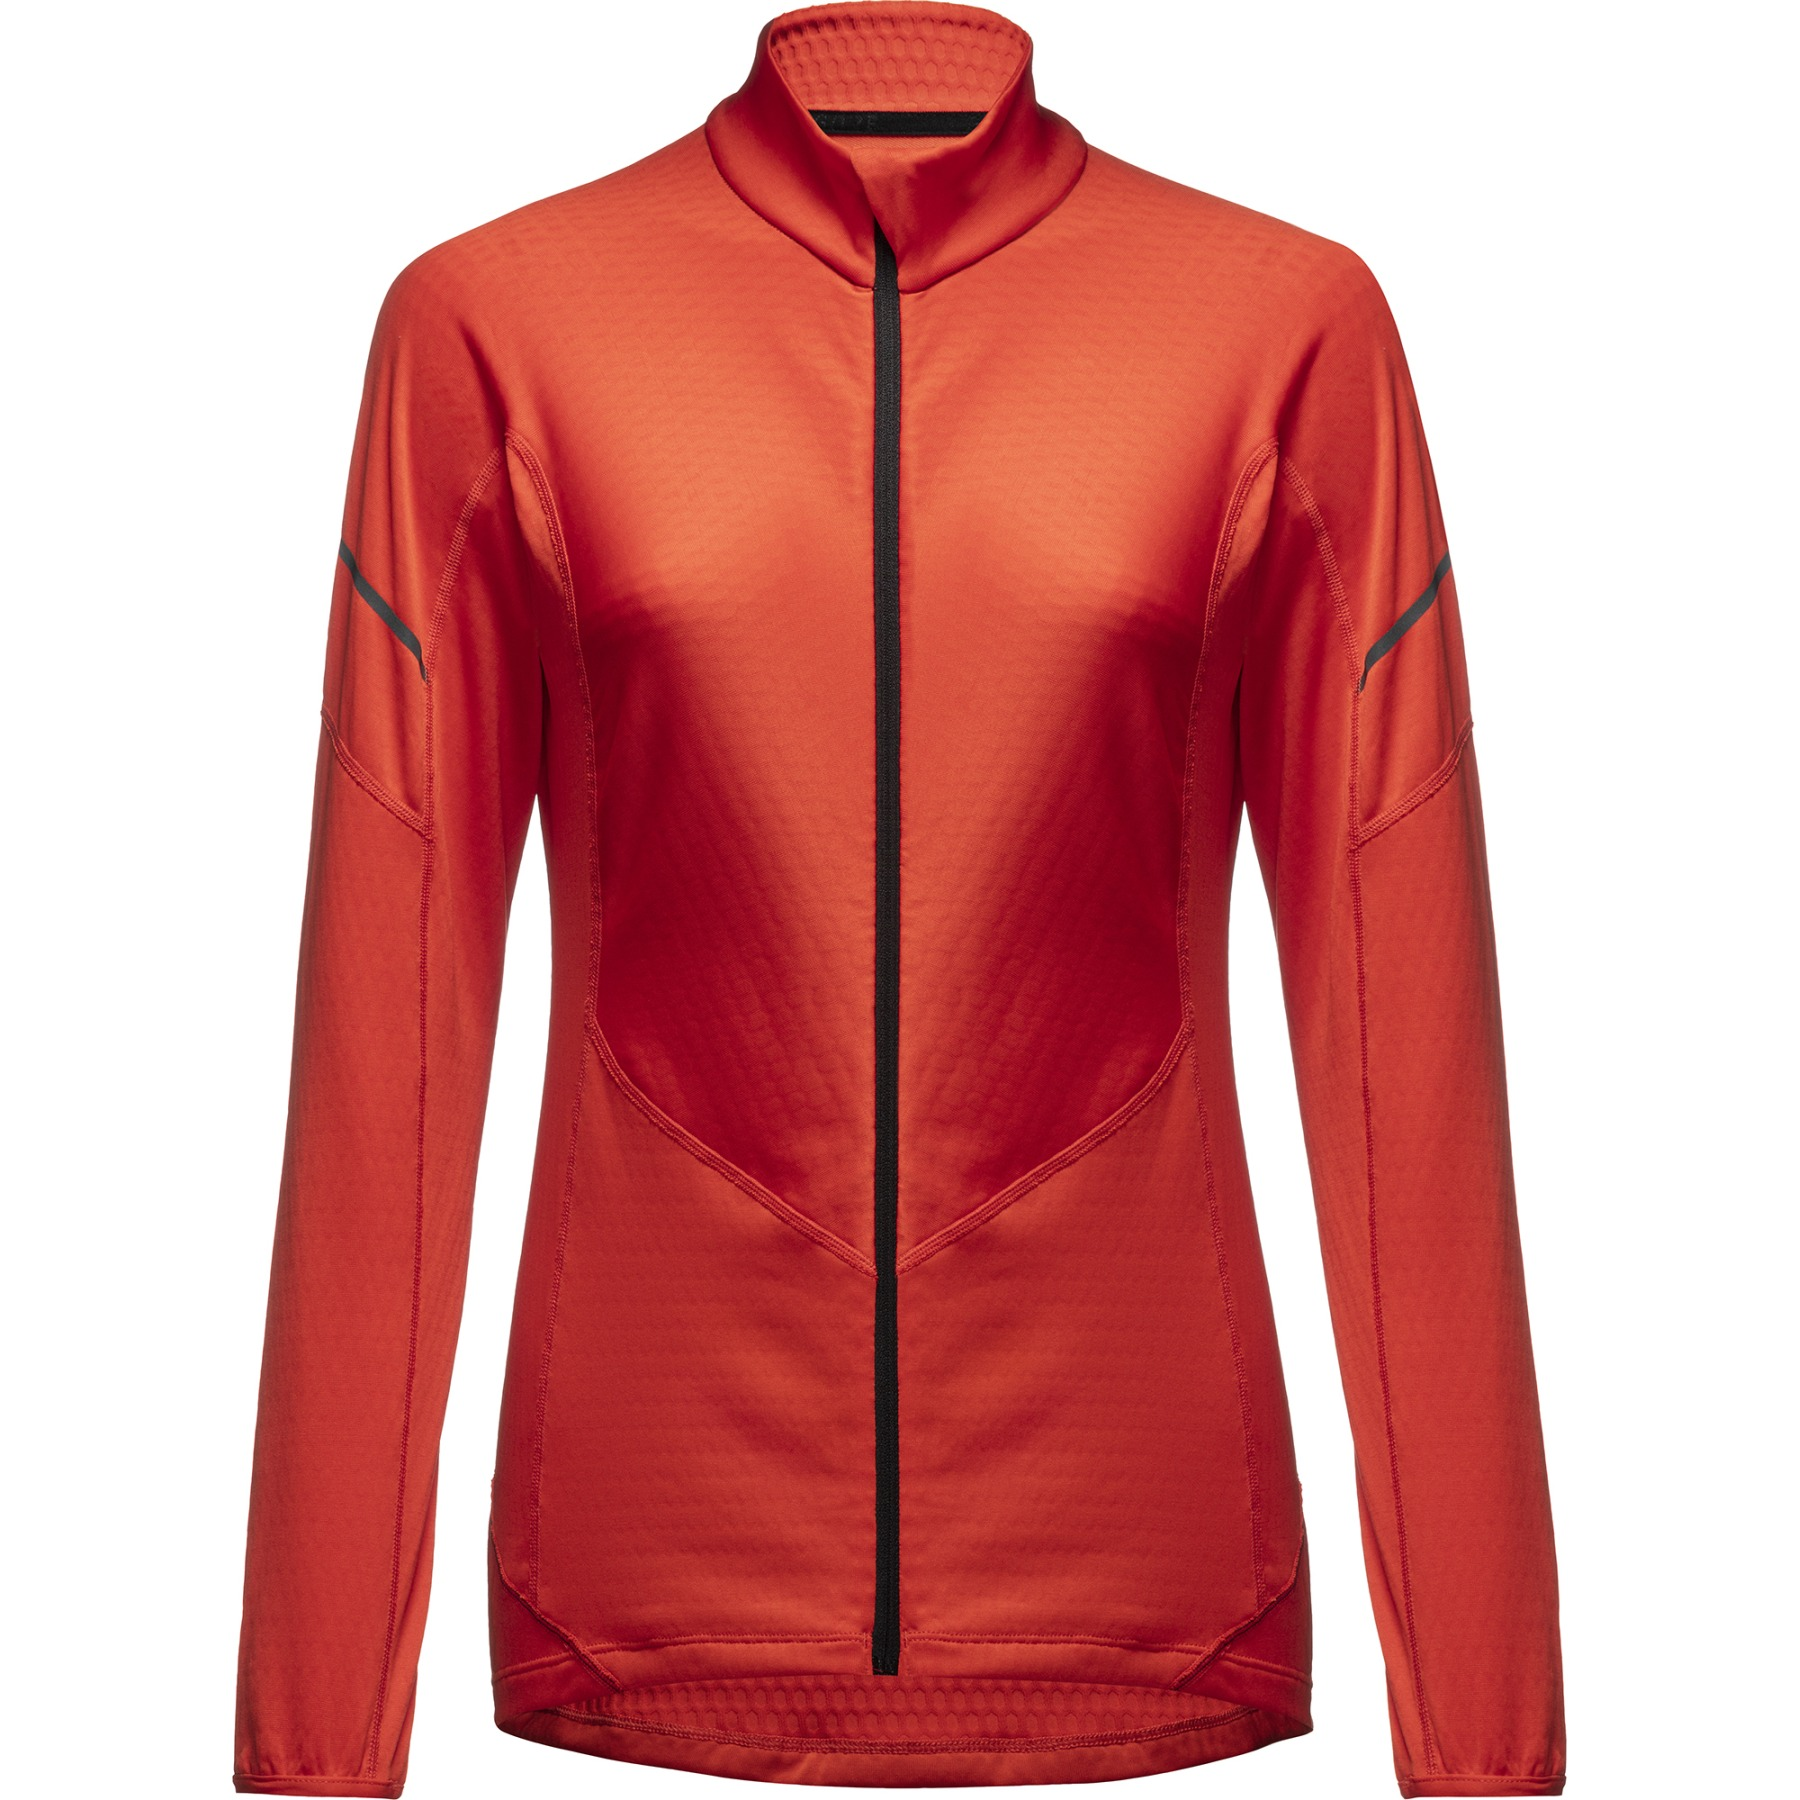 GORE Wear Thermo Zip Long Sleeve Shirt for Women - fireball AY00